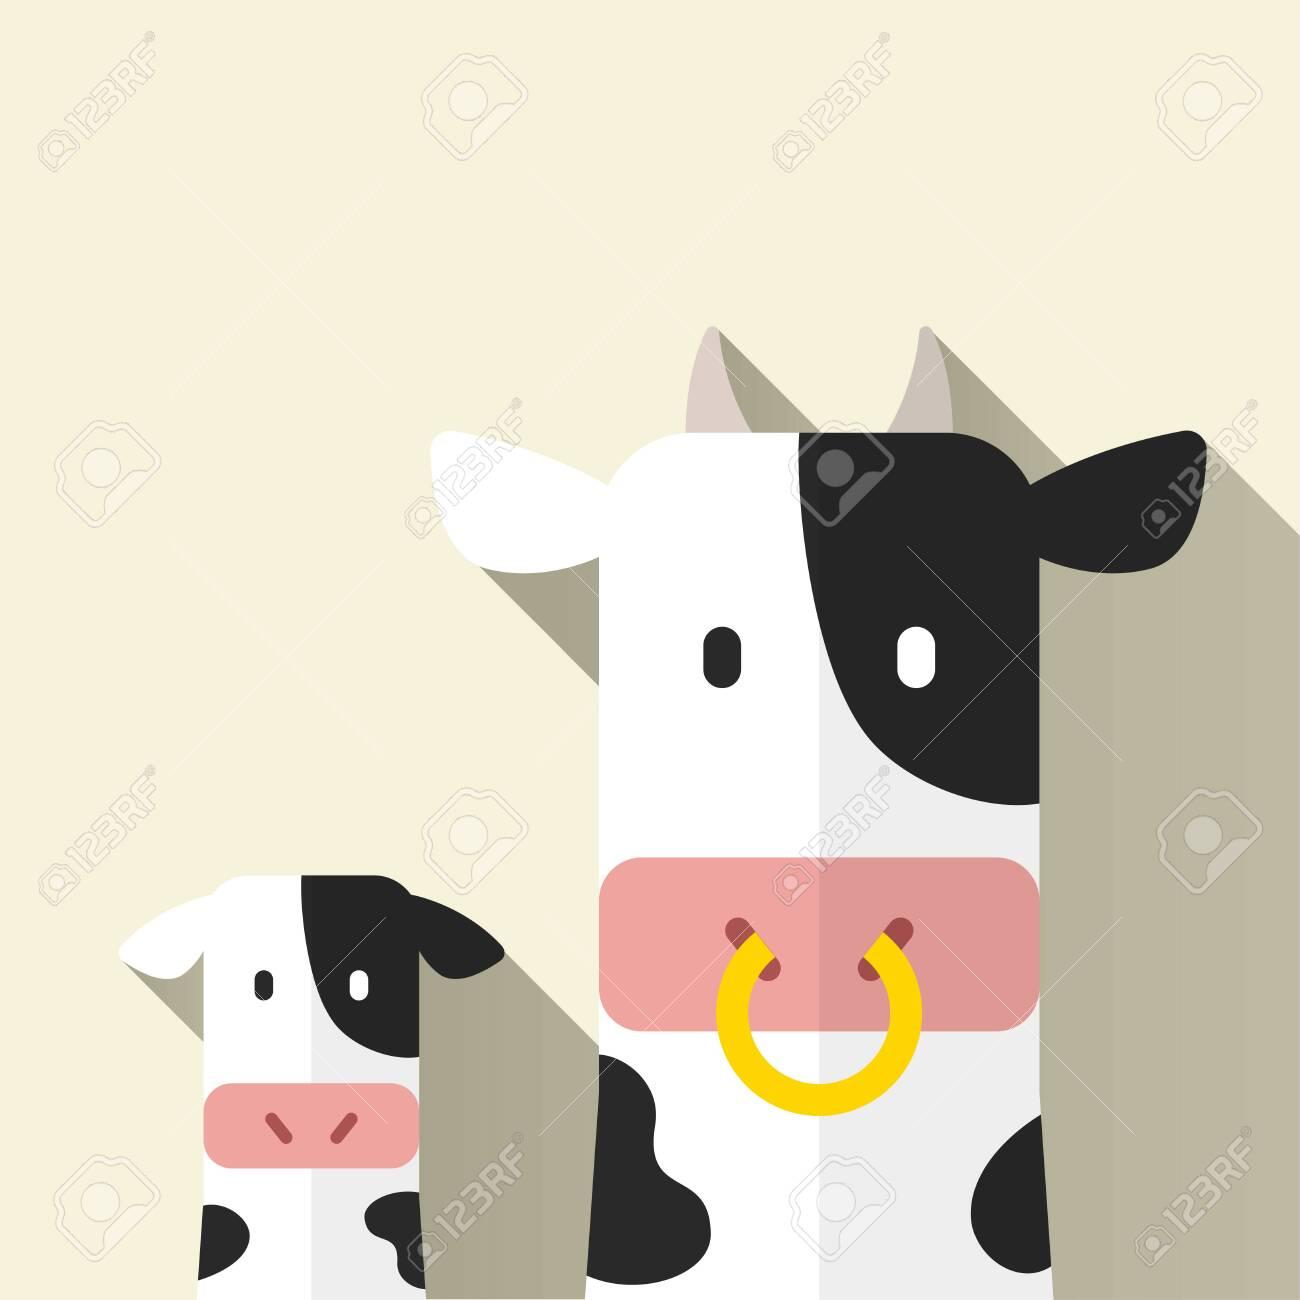 Cow parent and child, vector illustration, flat design - 154659813